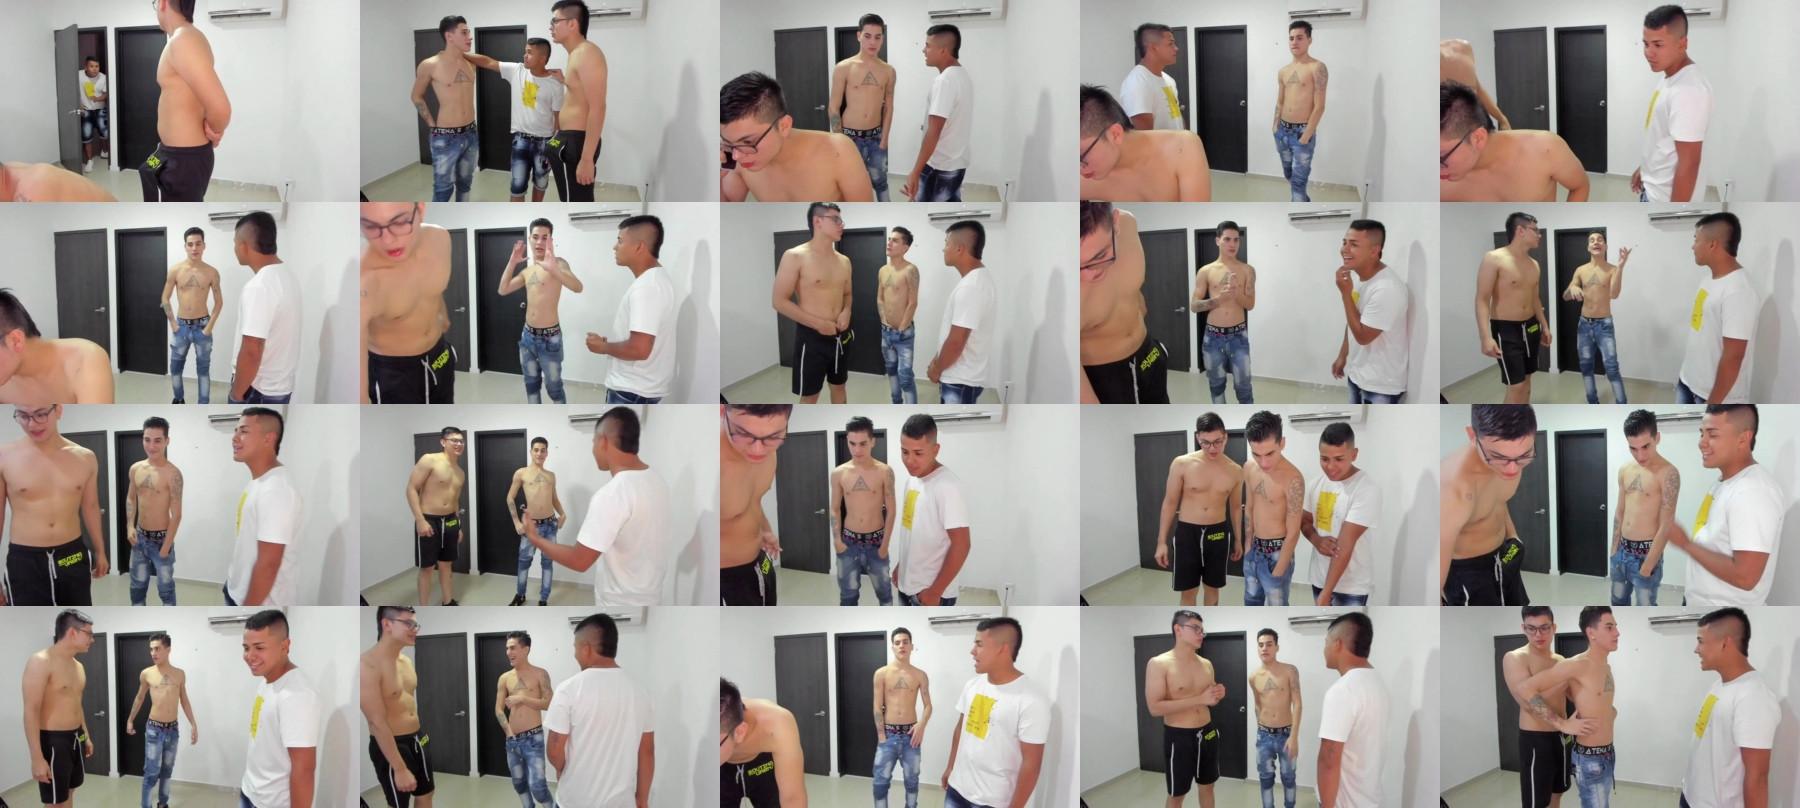 Badguys_Sex Porn CAM SHOW @ Chaturbate 05-05-2021